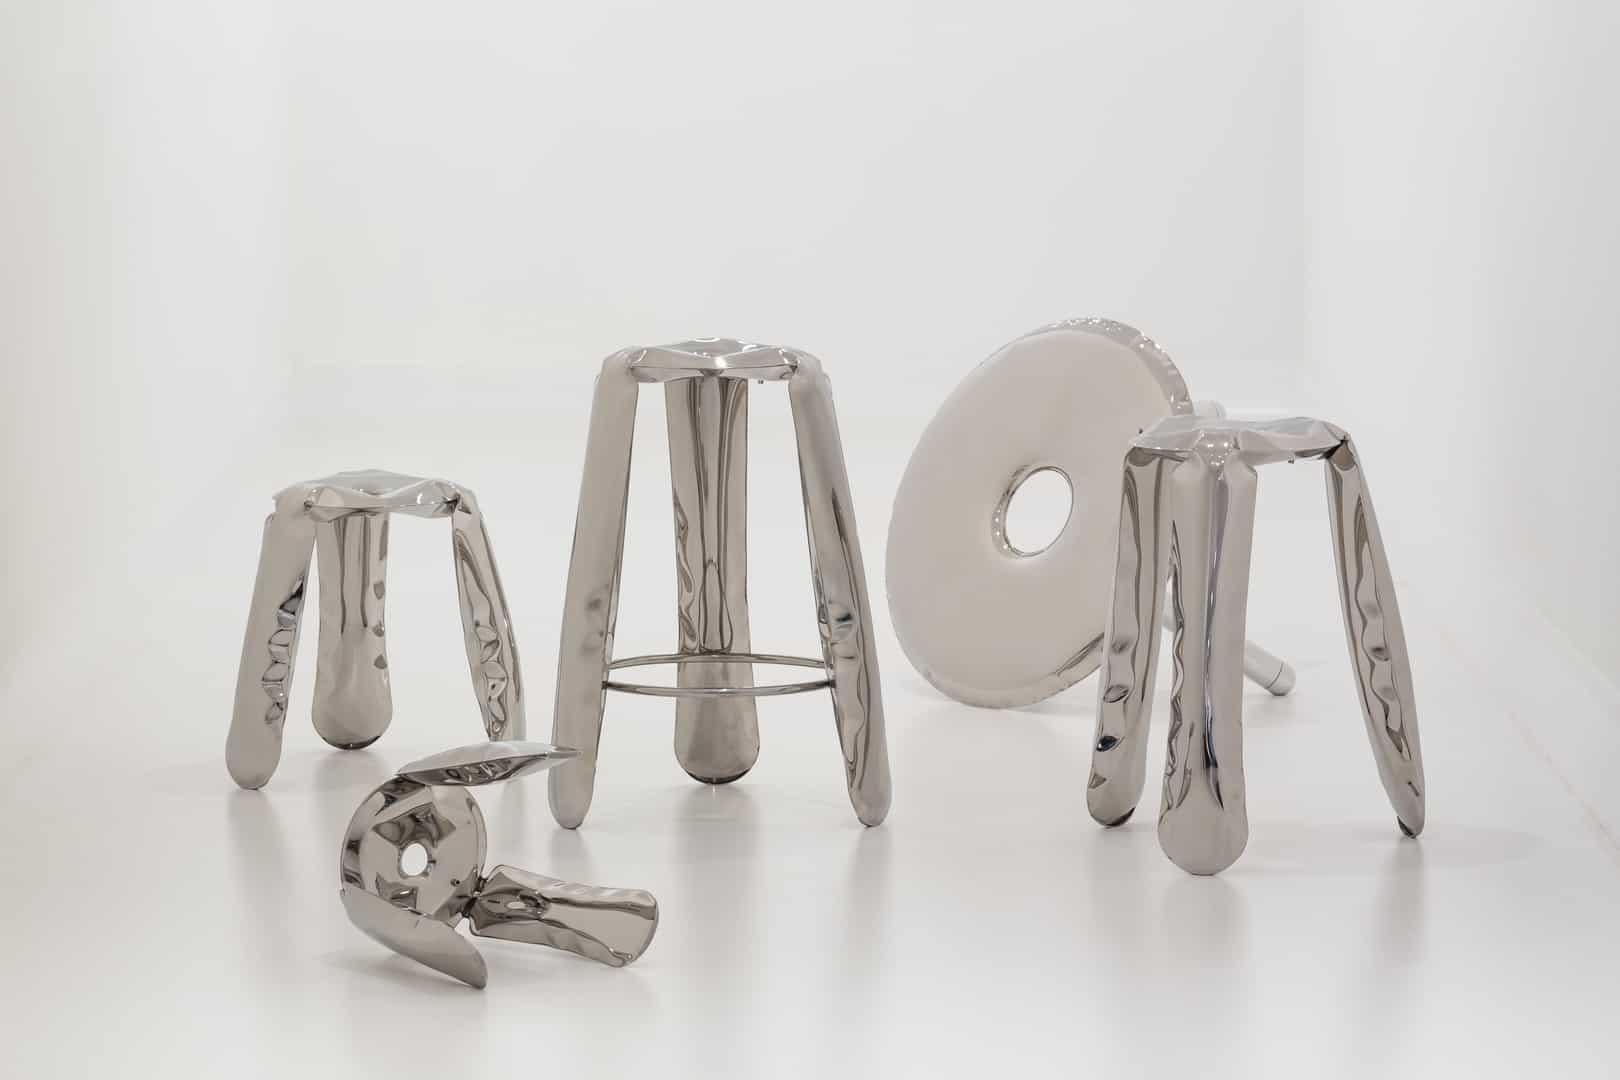 Fine Oskar Zieta In Search Of Innovative Technology Inzonedesignstudio Interior Chair Design Inzonedesignstudiocom